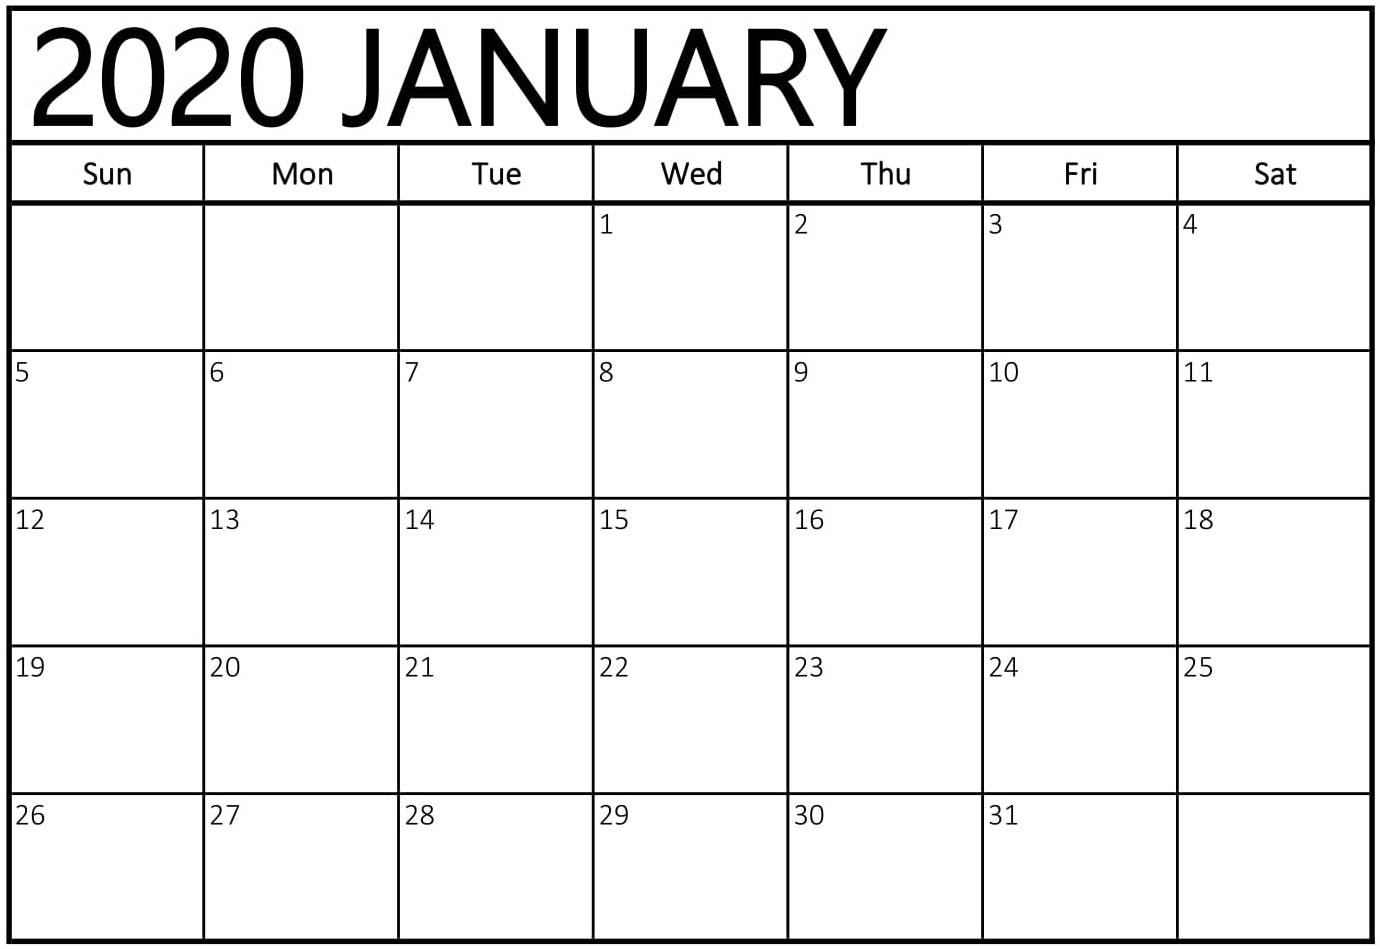 January 2020 Calendar Nz Printable With Holidays - Set Your